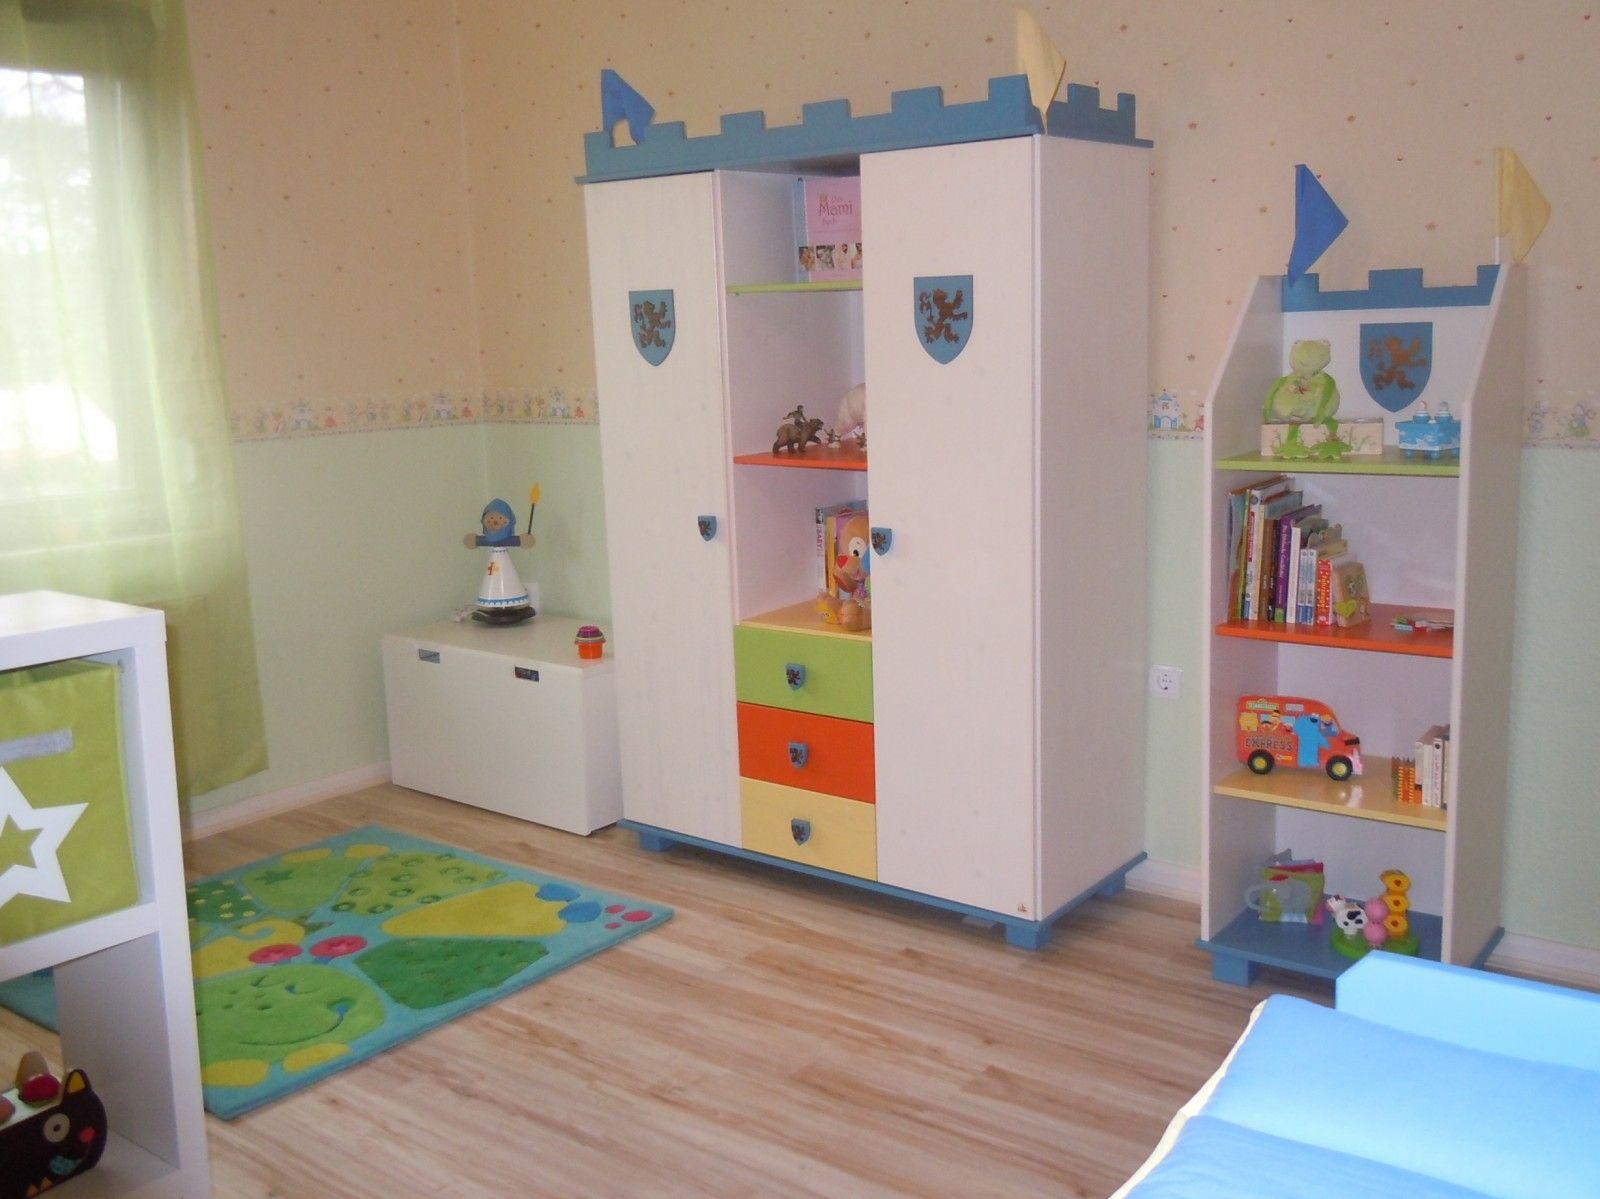 Kinderzimmer 'Ritter Julian' Kinder zimmer, Kinderzimmer